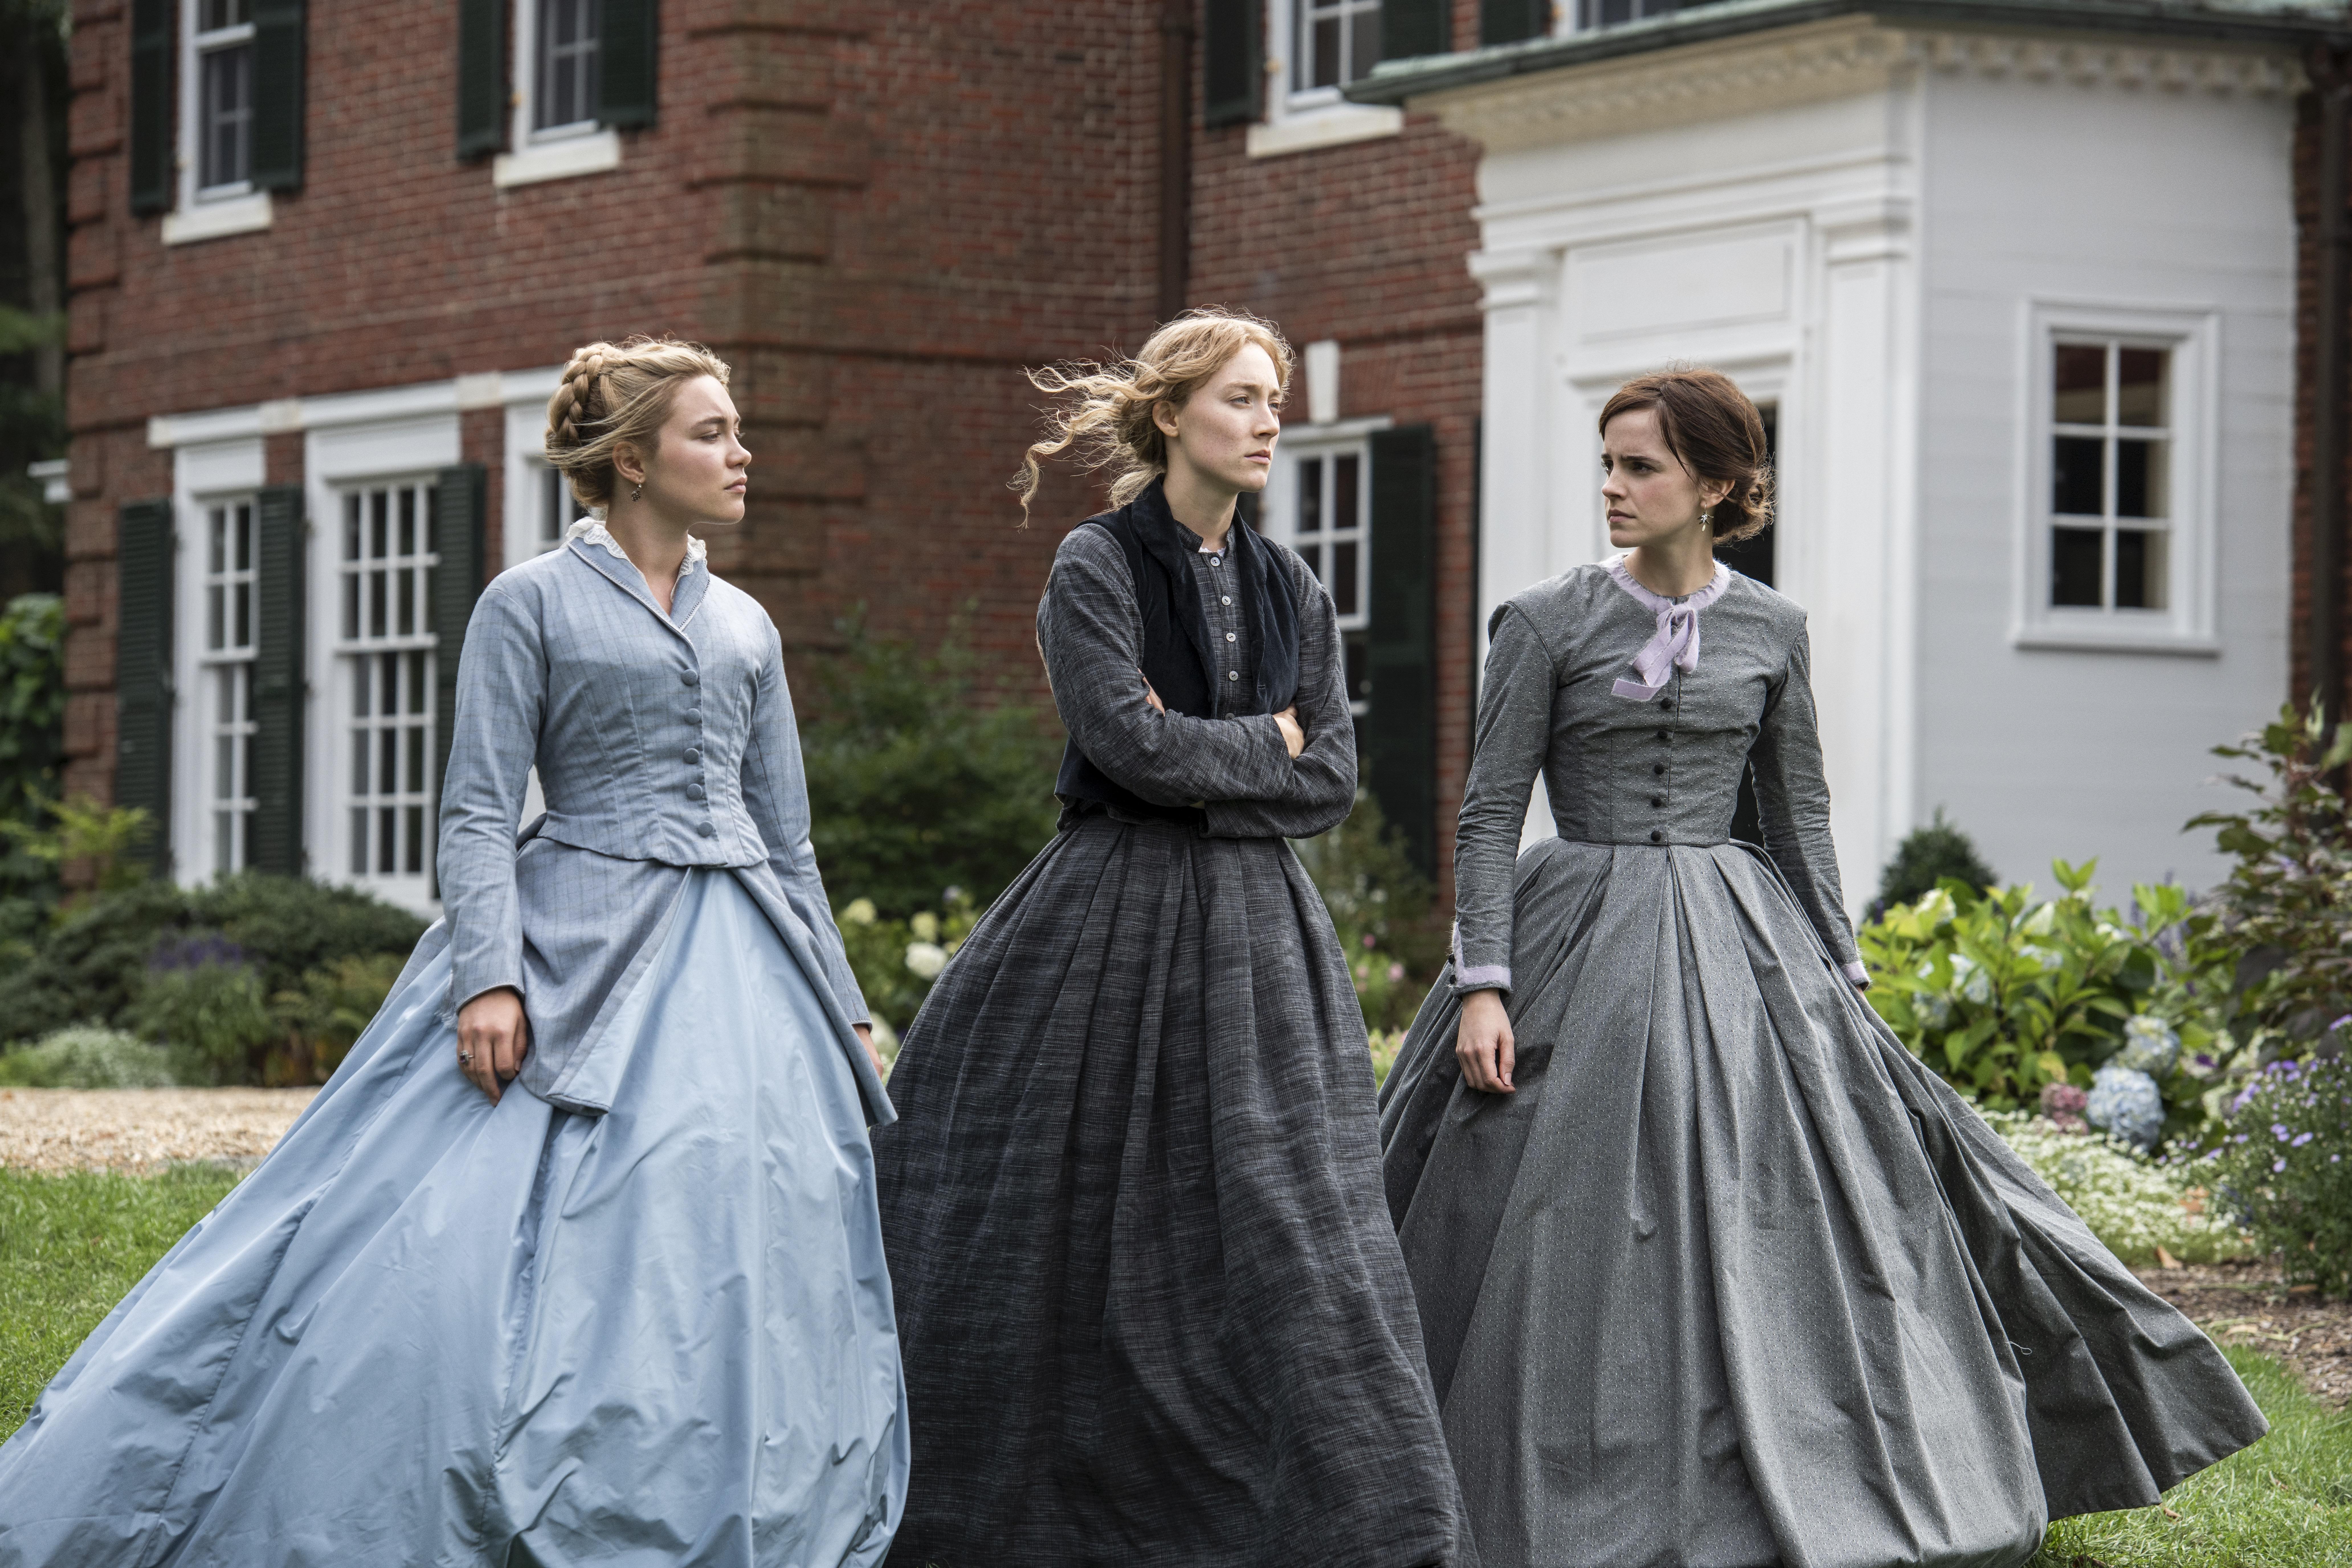 Florence Pugh, Saoirse Ronan and Emma Watson in Greta Gerwig's 'Little Women.'